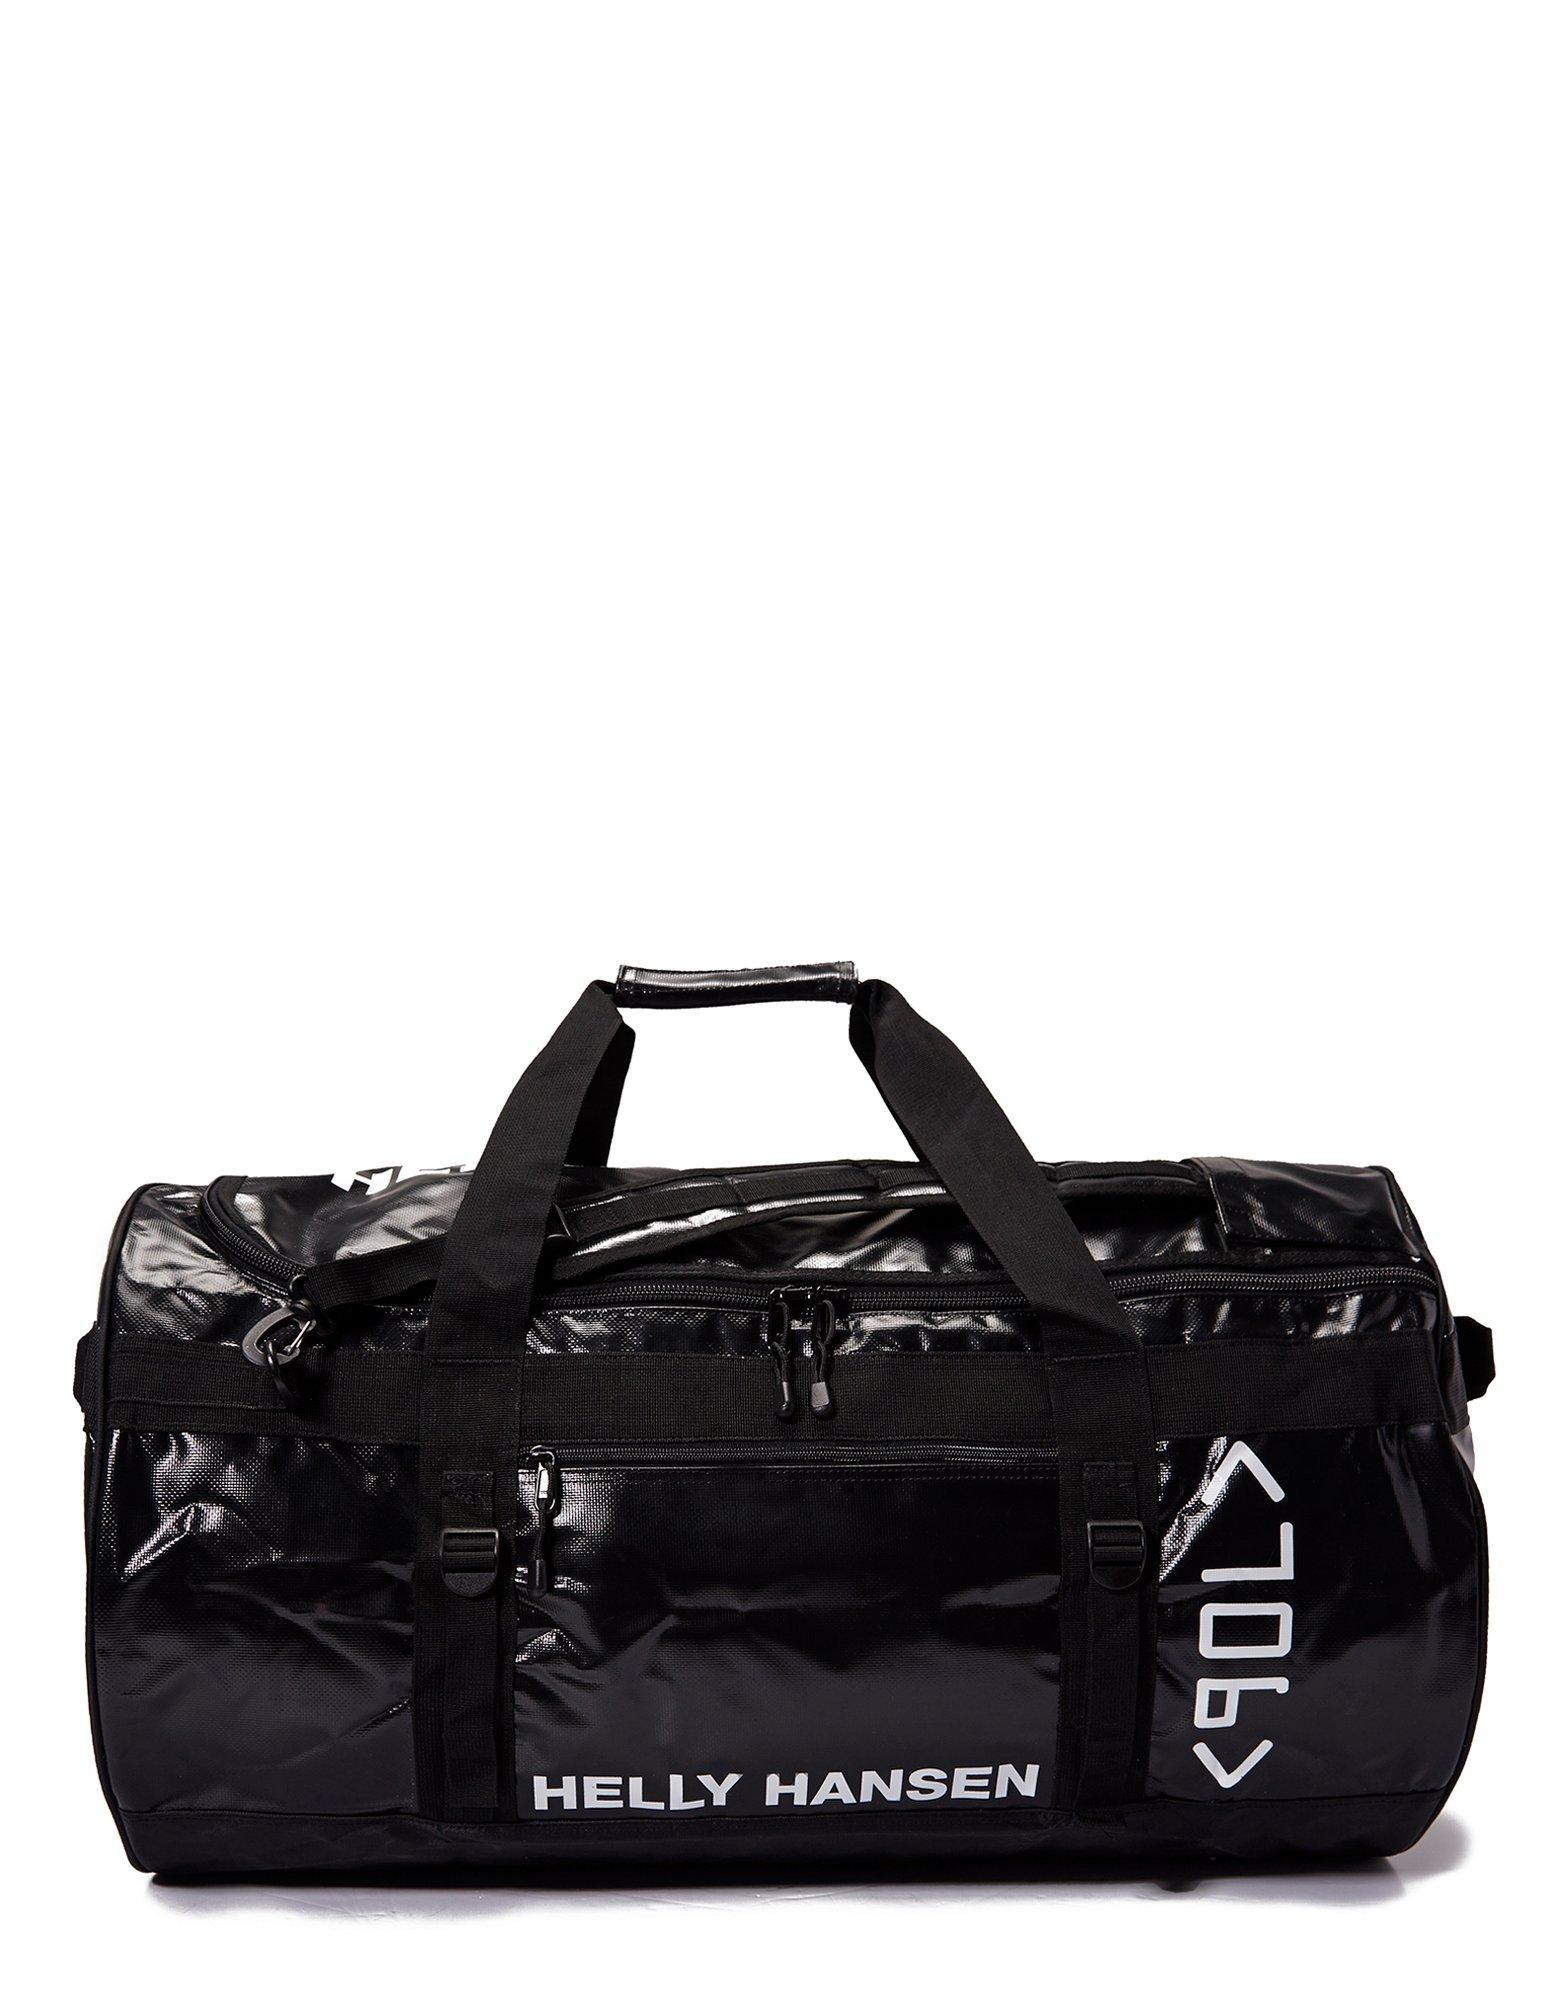 a2090df4c7 Helly Hansen Duffle Bag 90l in Black for Men - Lyst